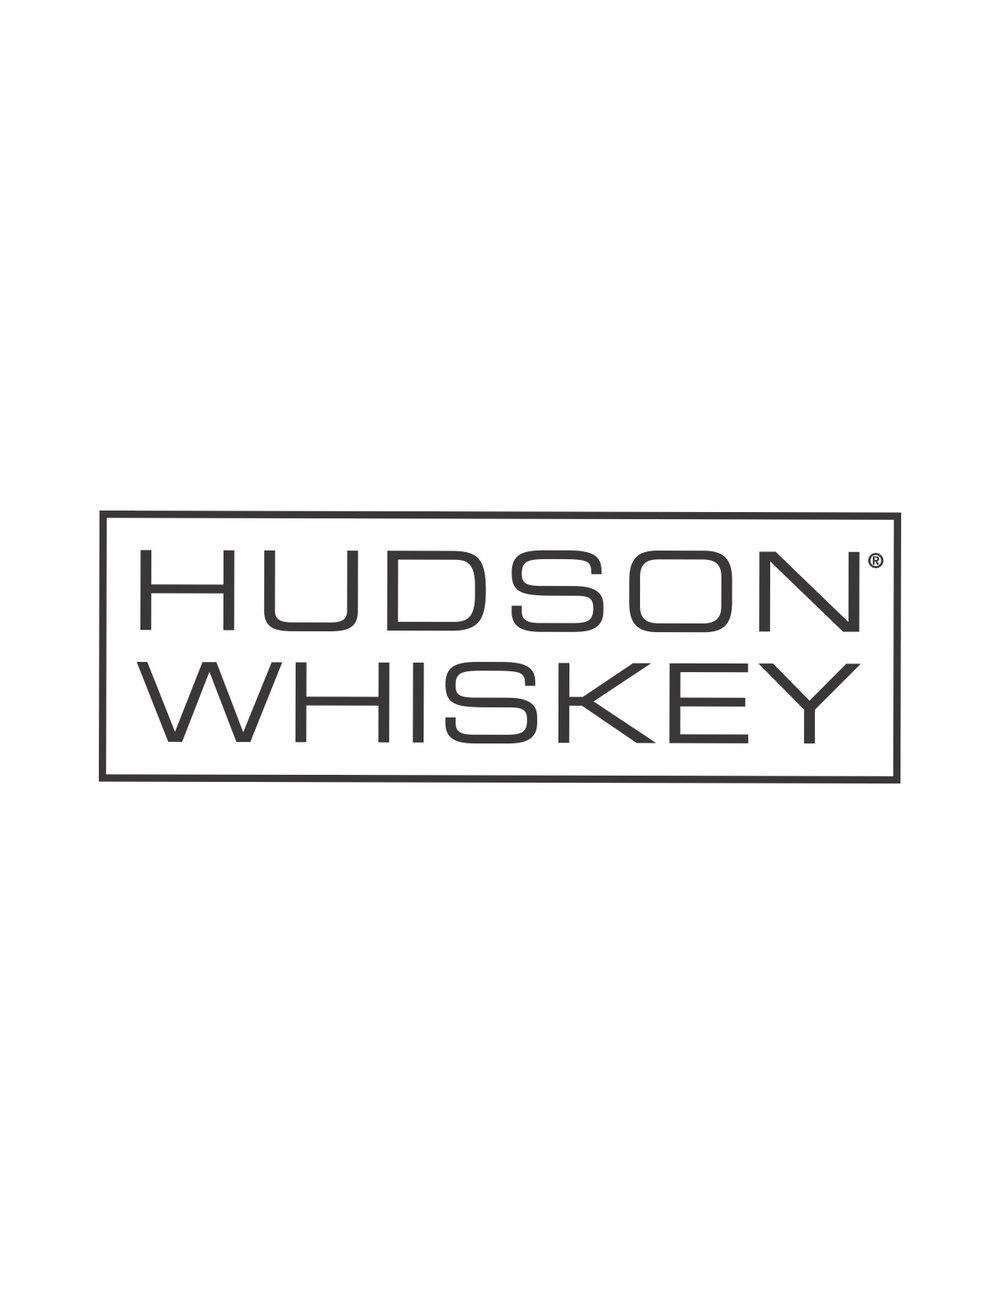 hudson whiskey logo.jpeg